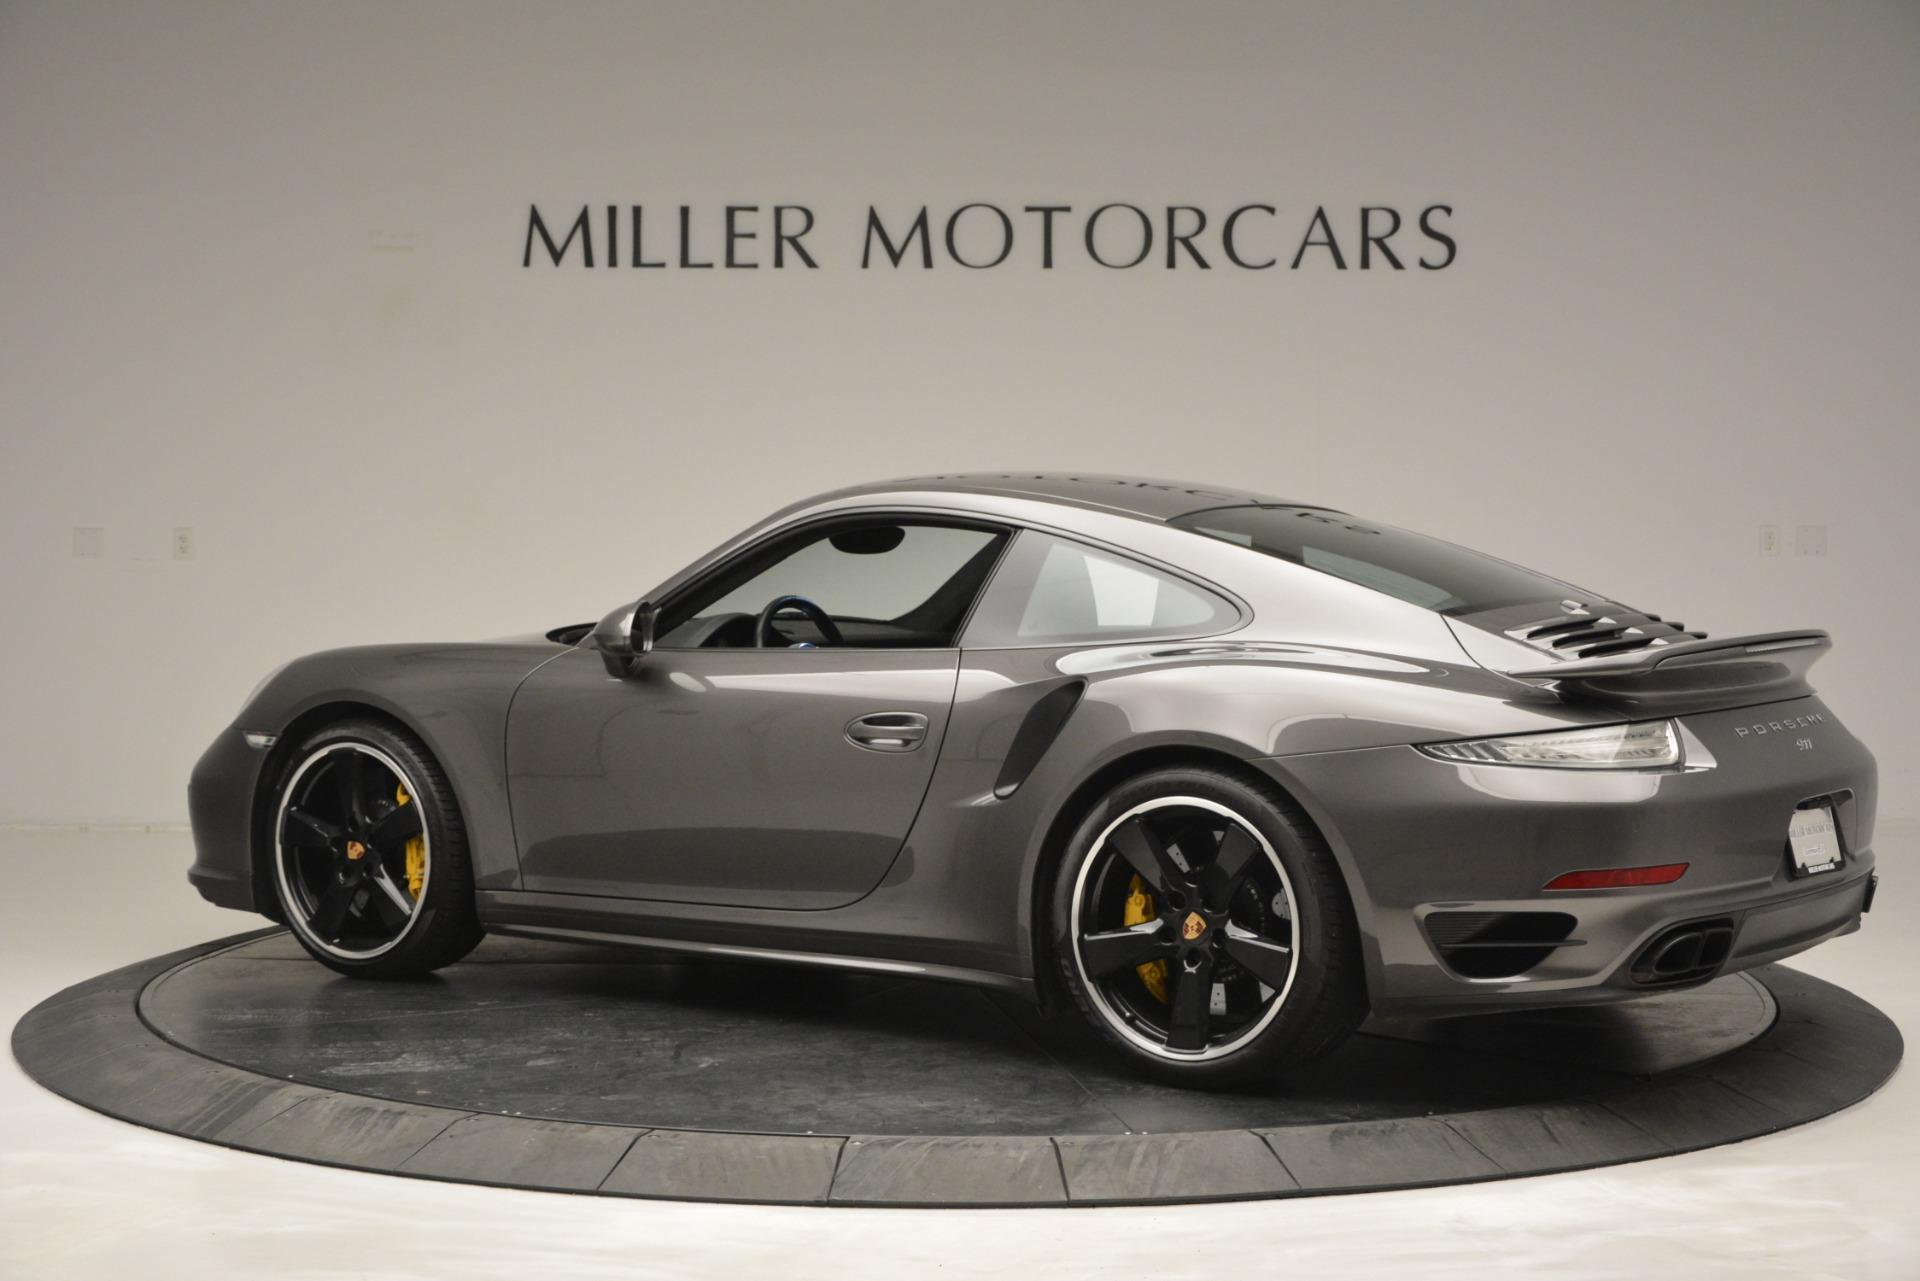 Used 2015 Porsche 911 Turbo S For Sale In Greenwich, CT 2923_p4